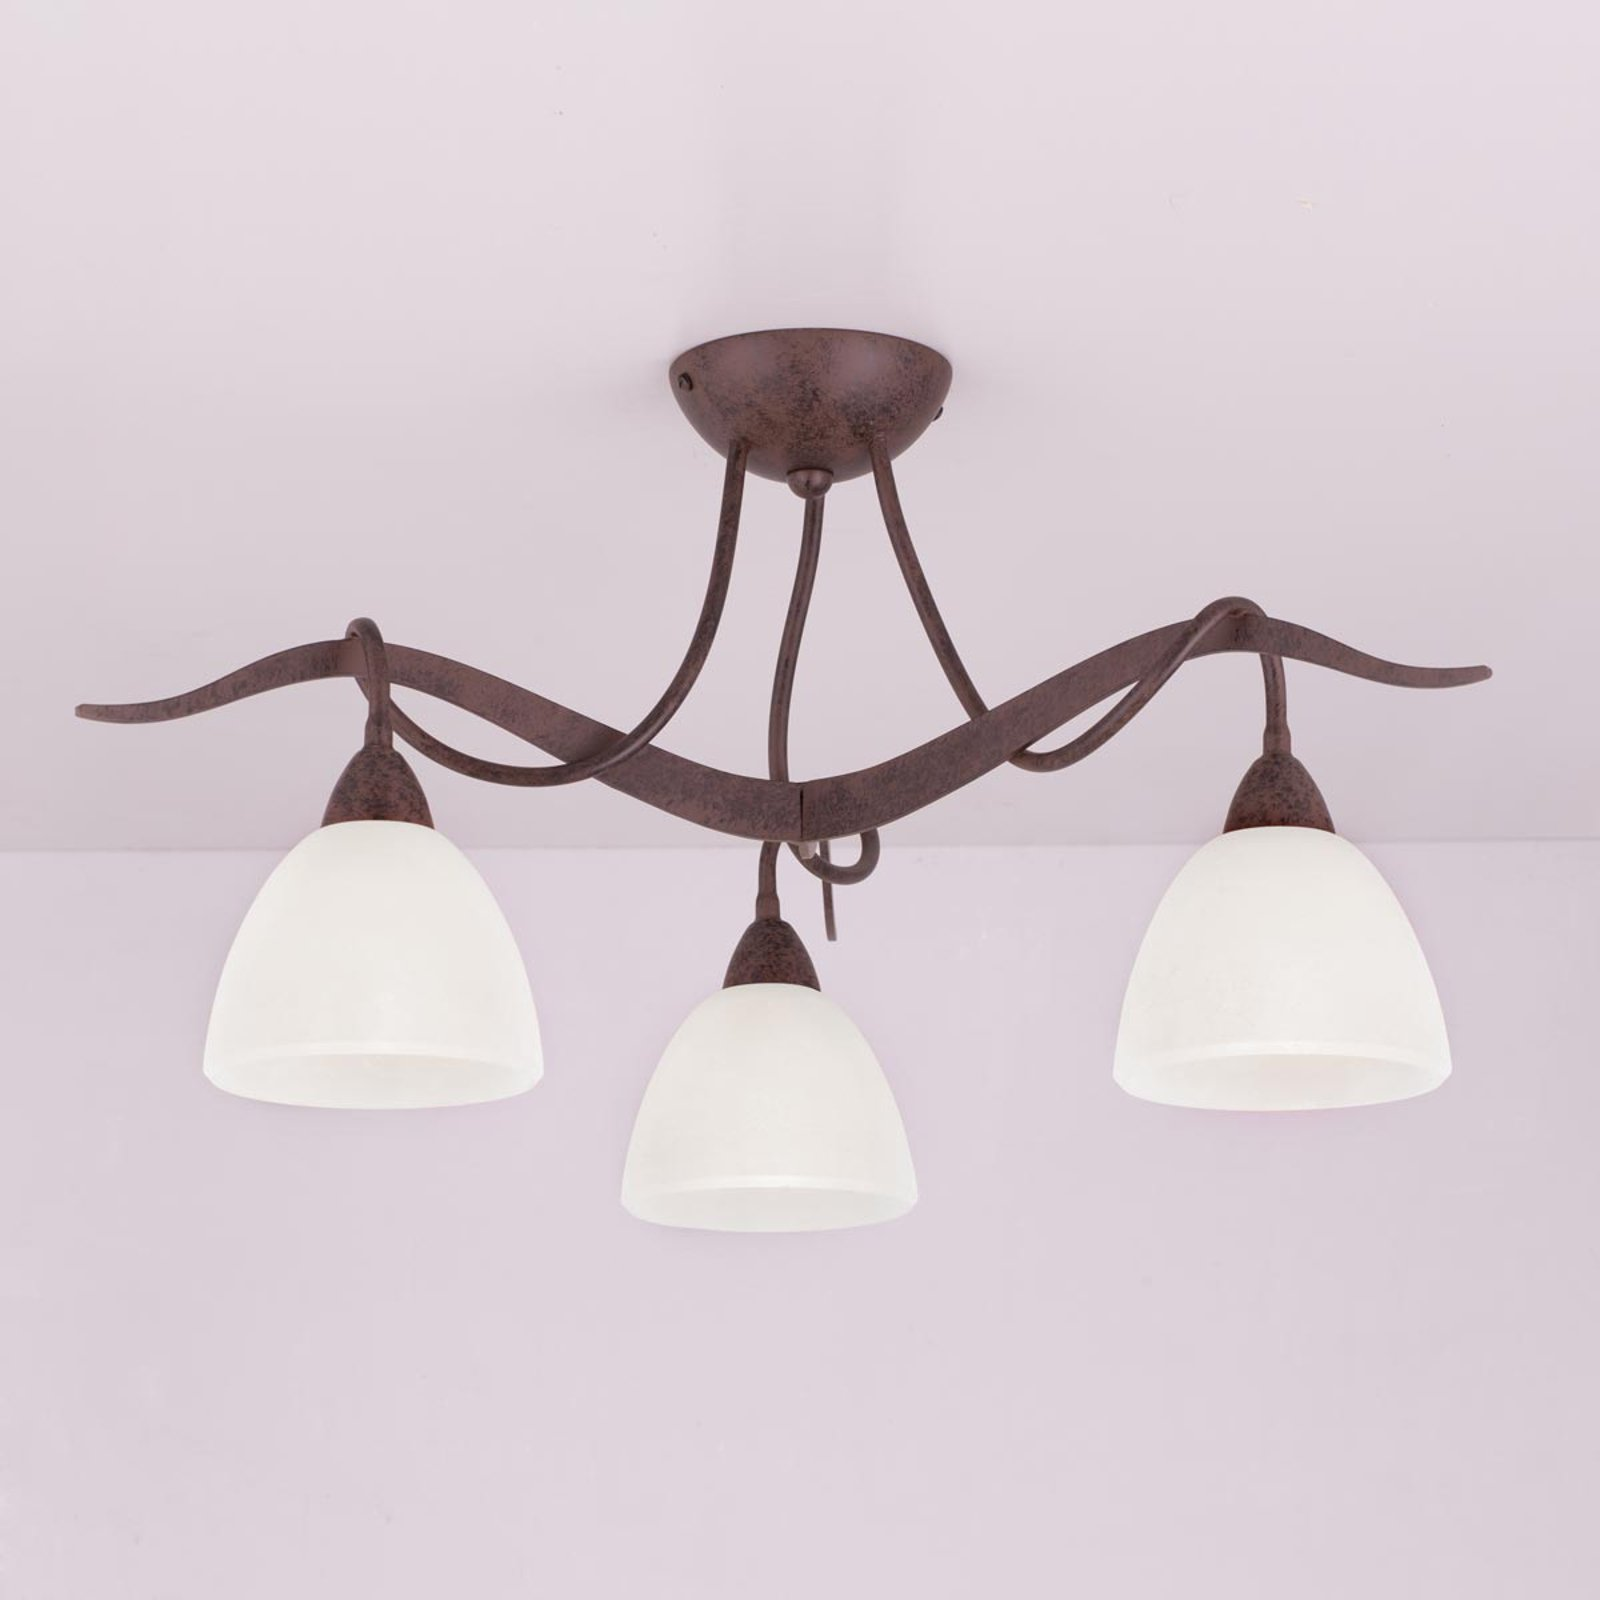 Taklampe Samuele i landlig stil 3 lys, scavo